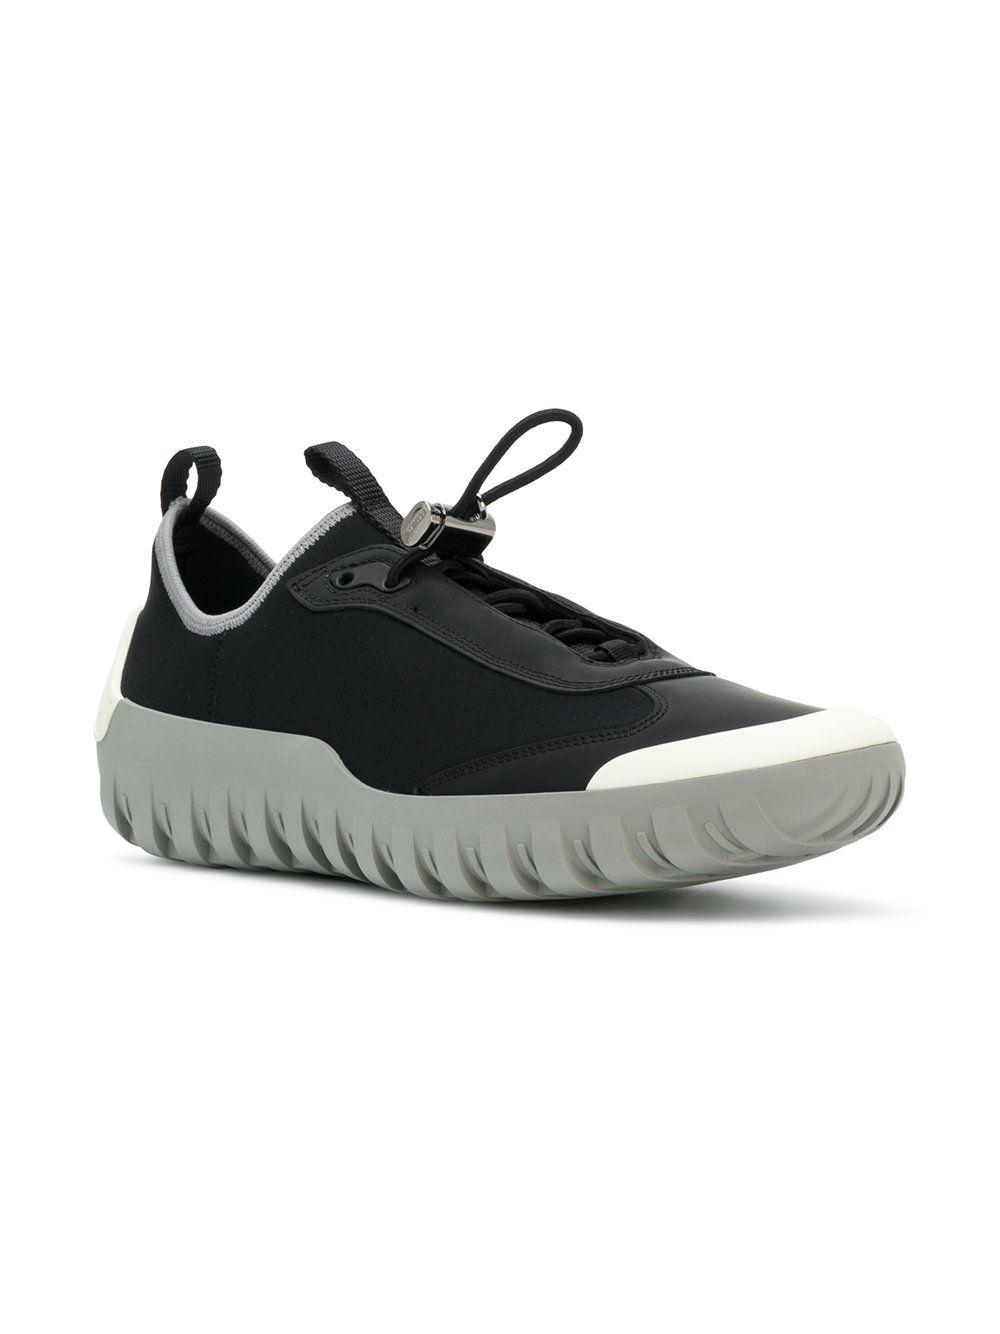 2019 discount sale shop for original classcic Nestled In Neoprene: Prada Neoprene Laceless Sneakers ...